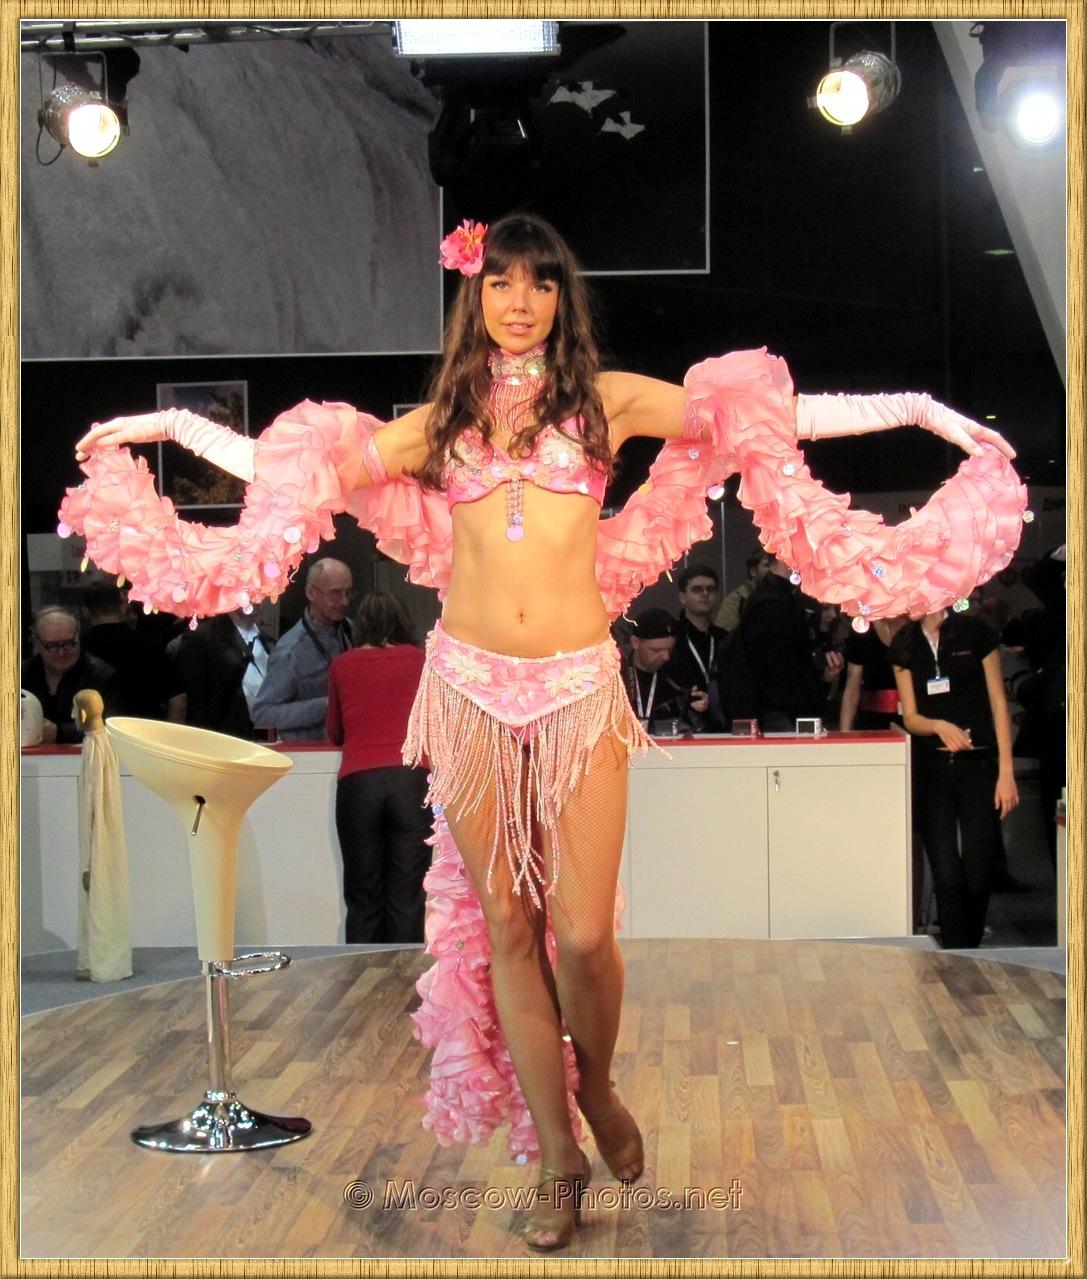 Moscow Dancing Girl at Photoforum